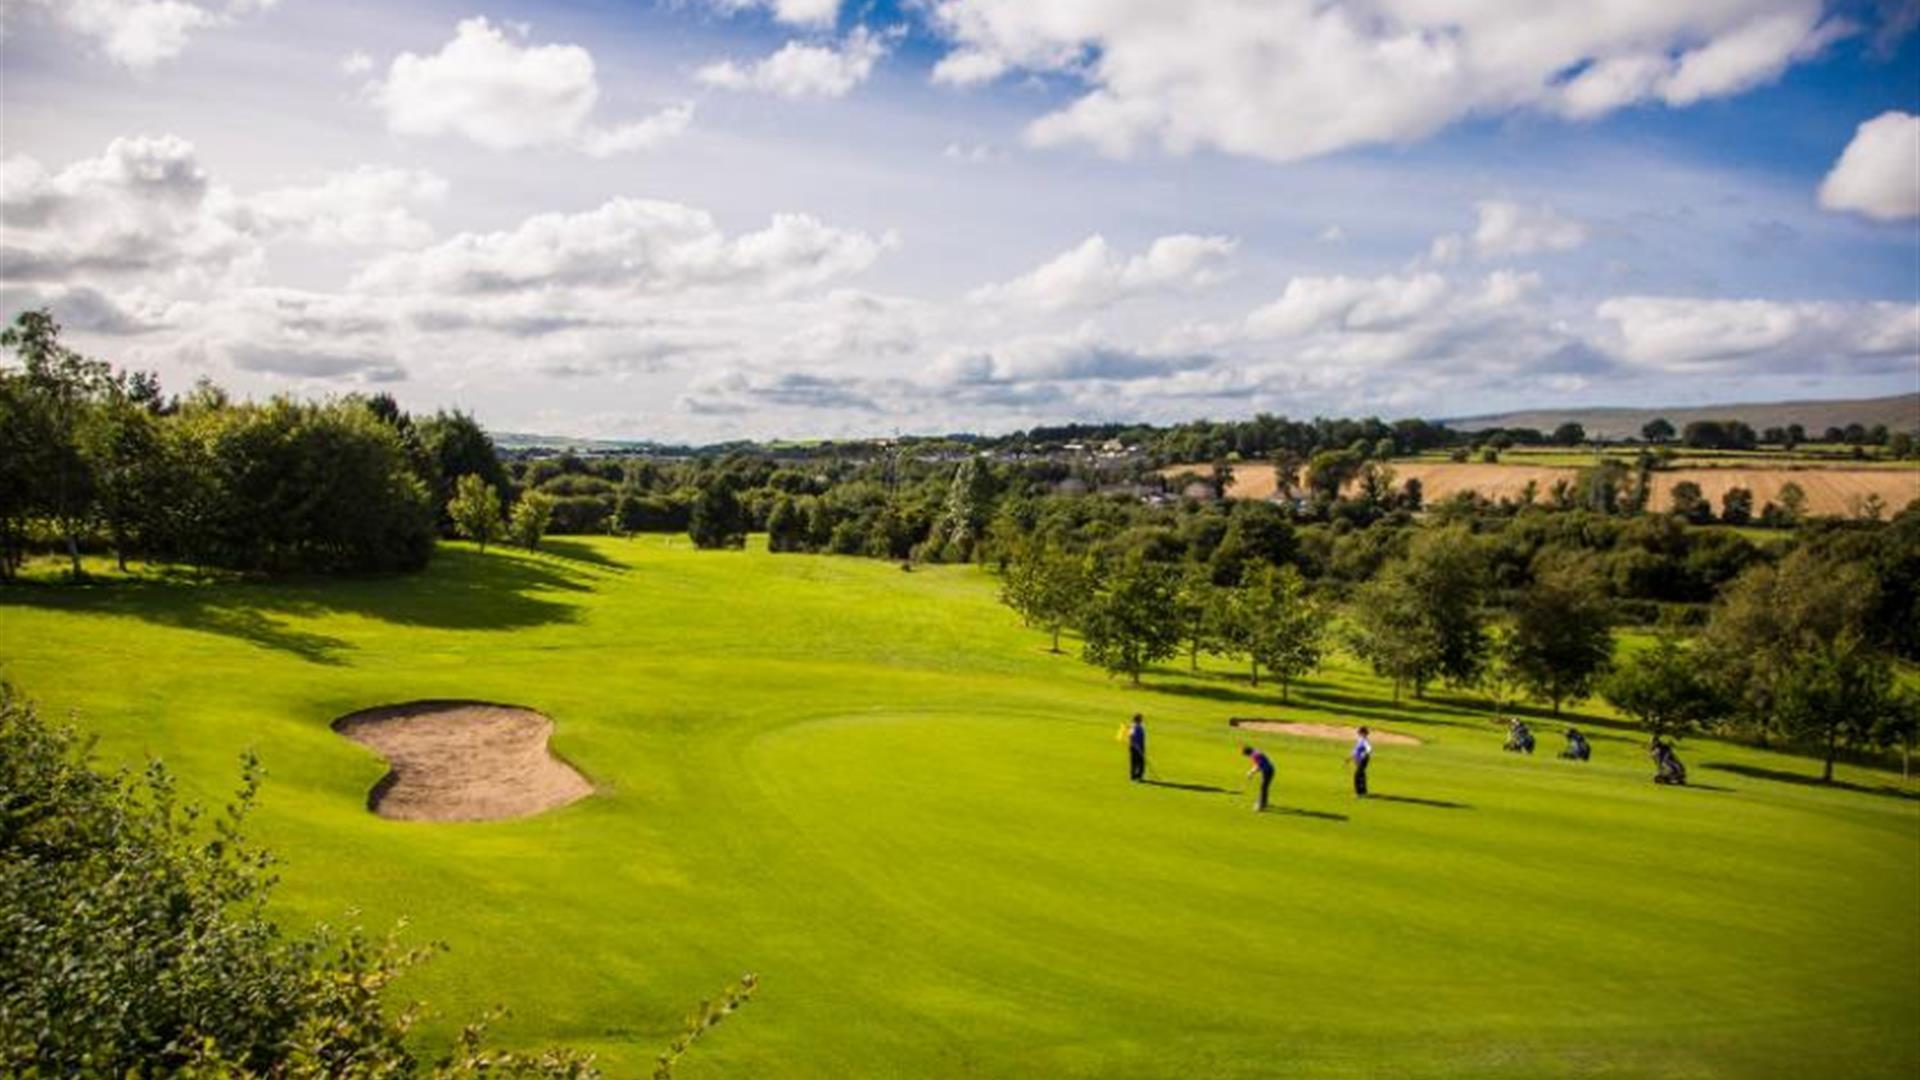 Foyle Golf Centre